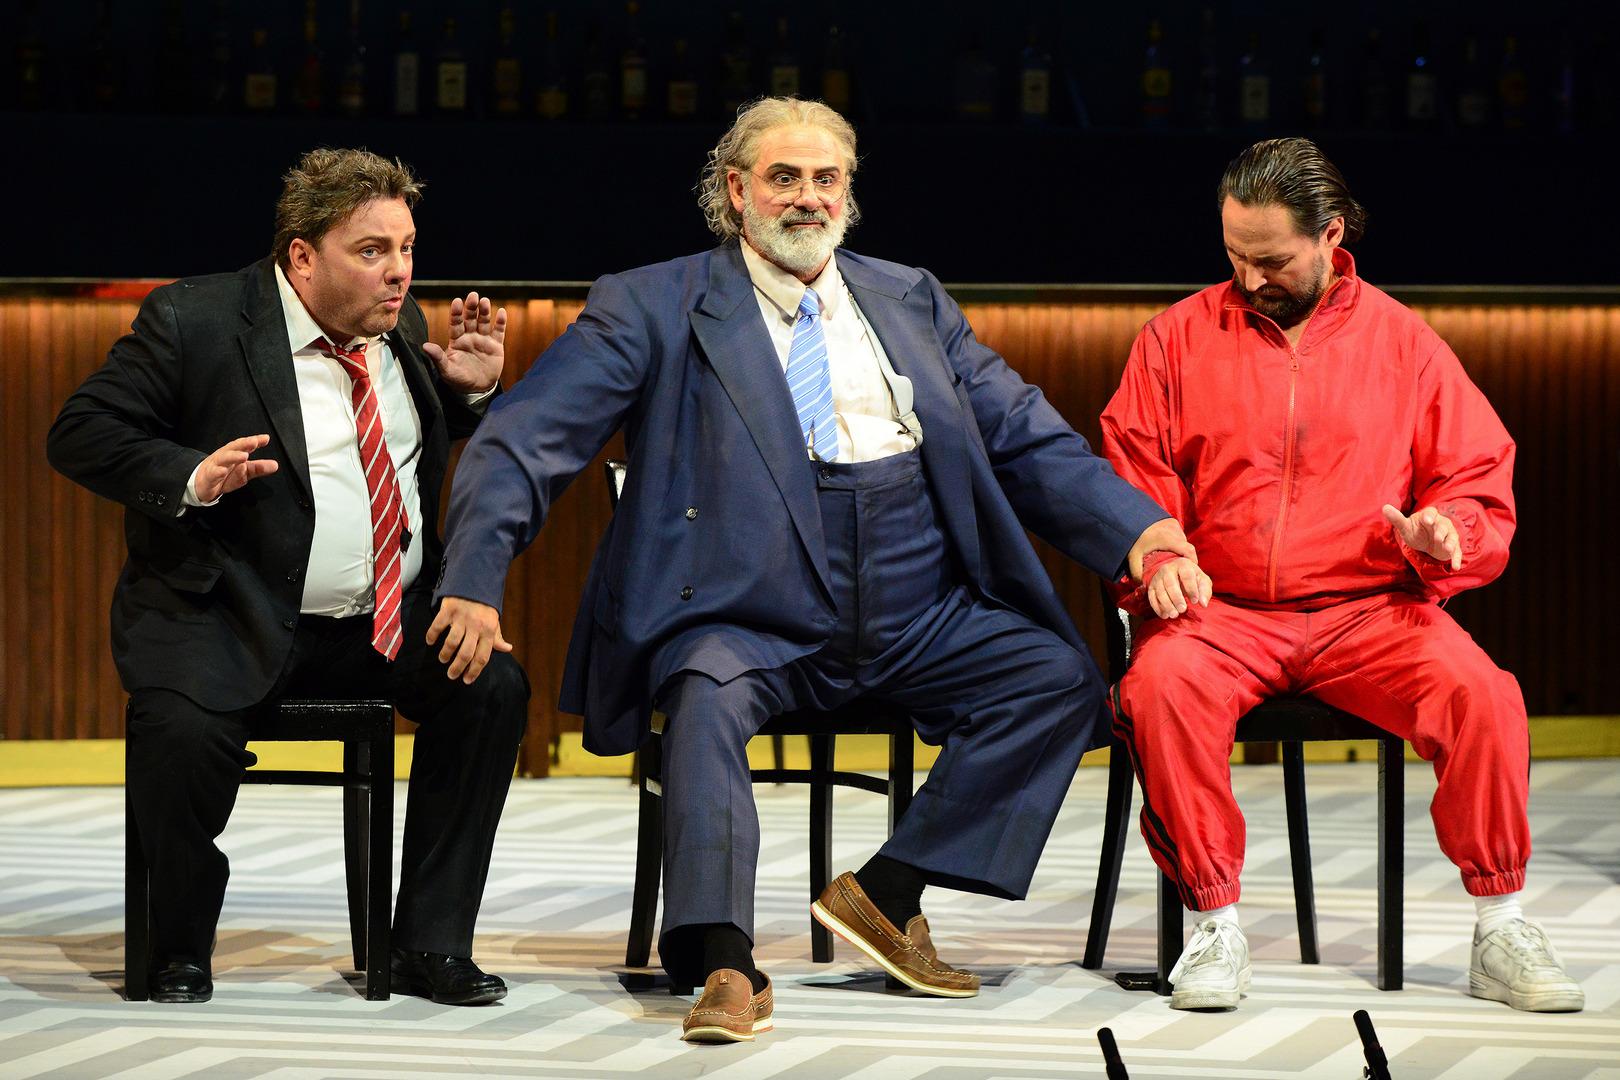 Falstaff-Opera-by-Giuseppe-Verdi-directed-by-Jacopo-Spirei- in-Karlsruhe-4